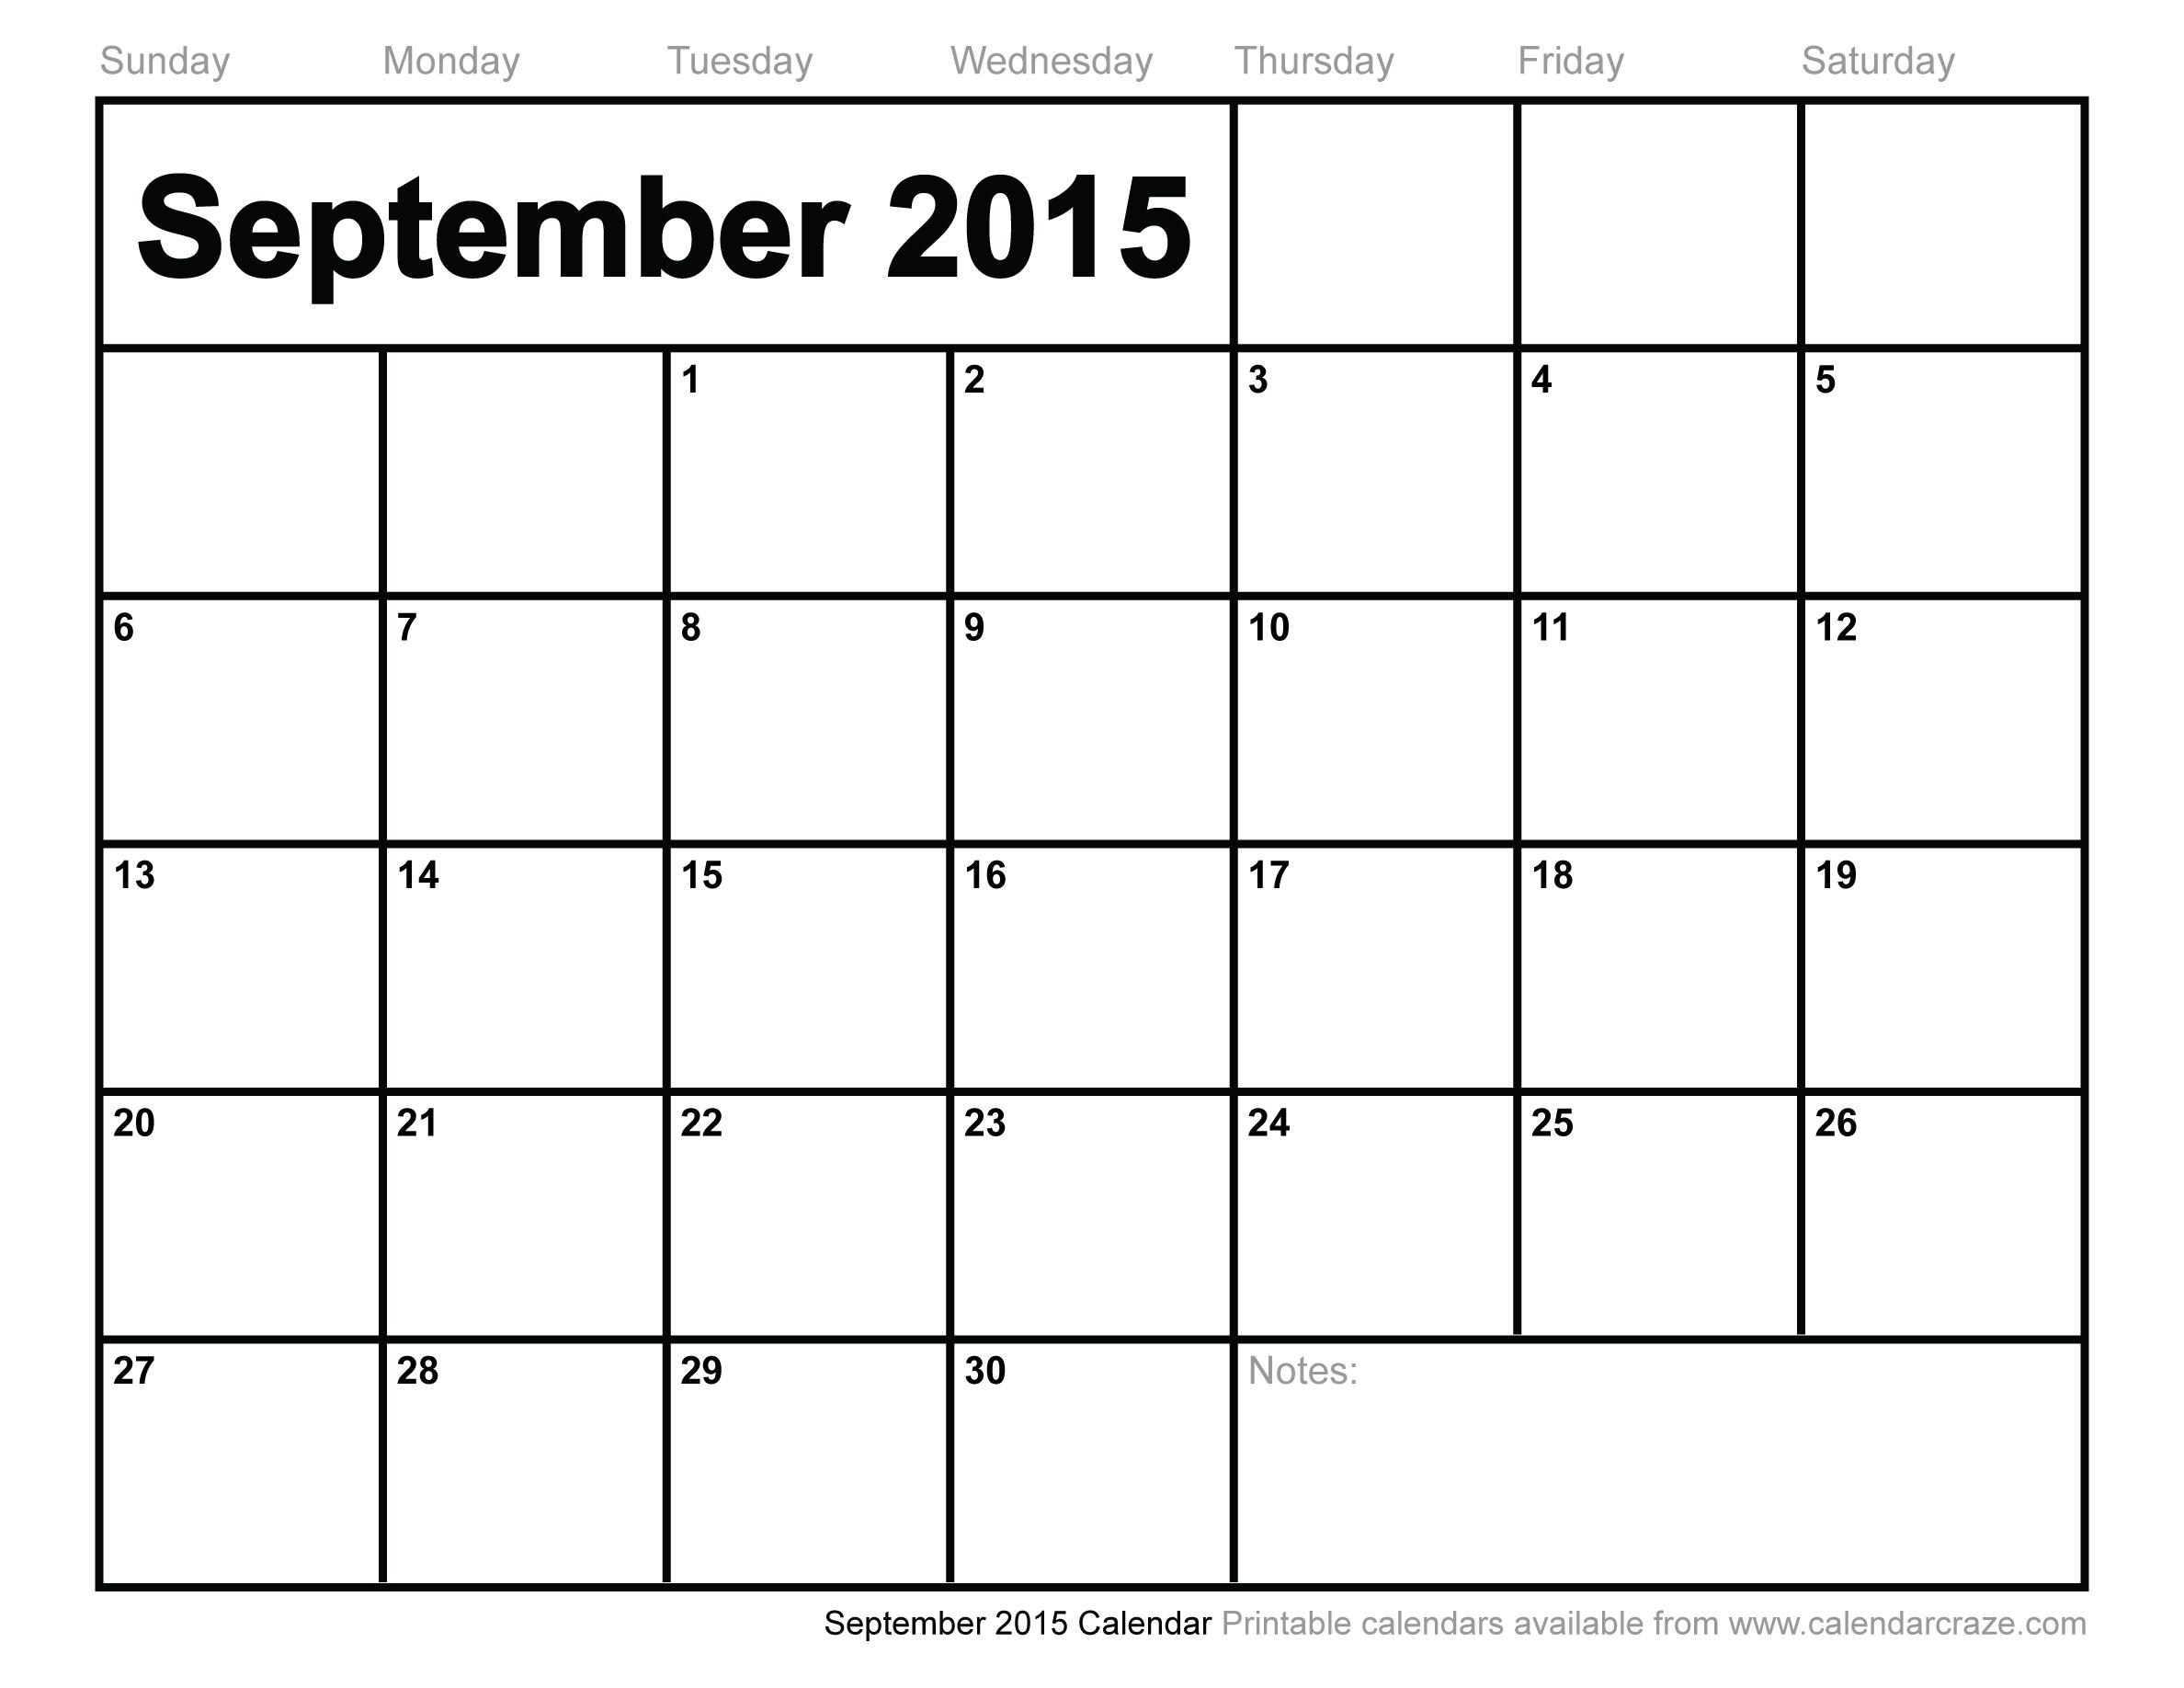 9 Images of September 2015 Calendar Printable Large Print